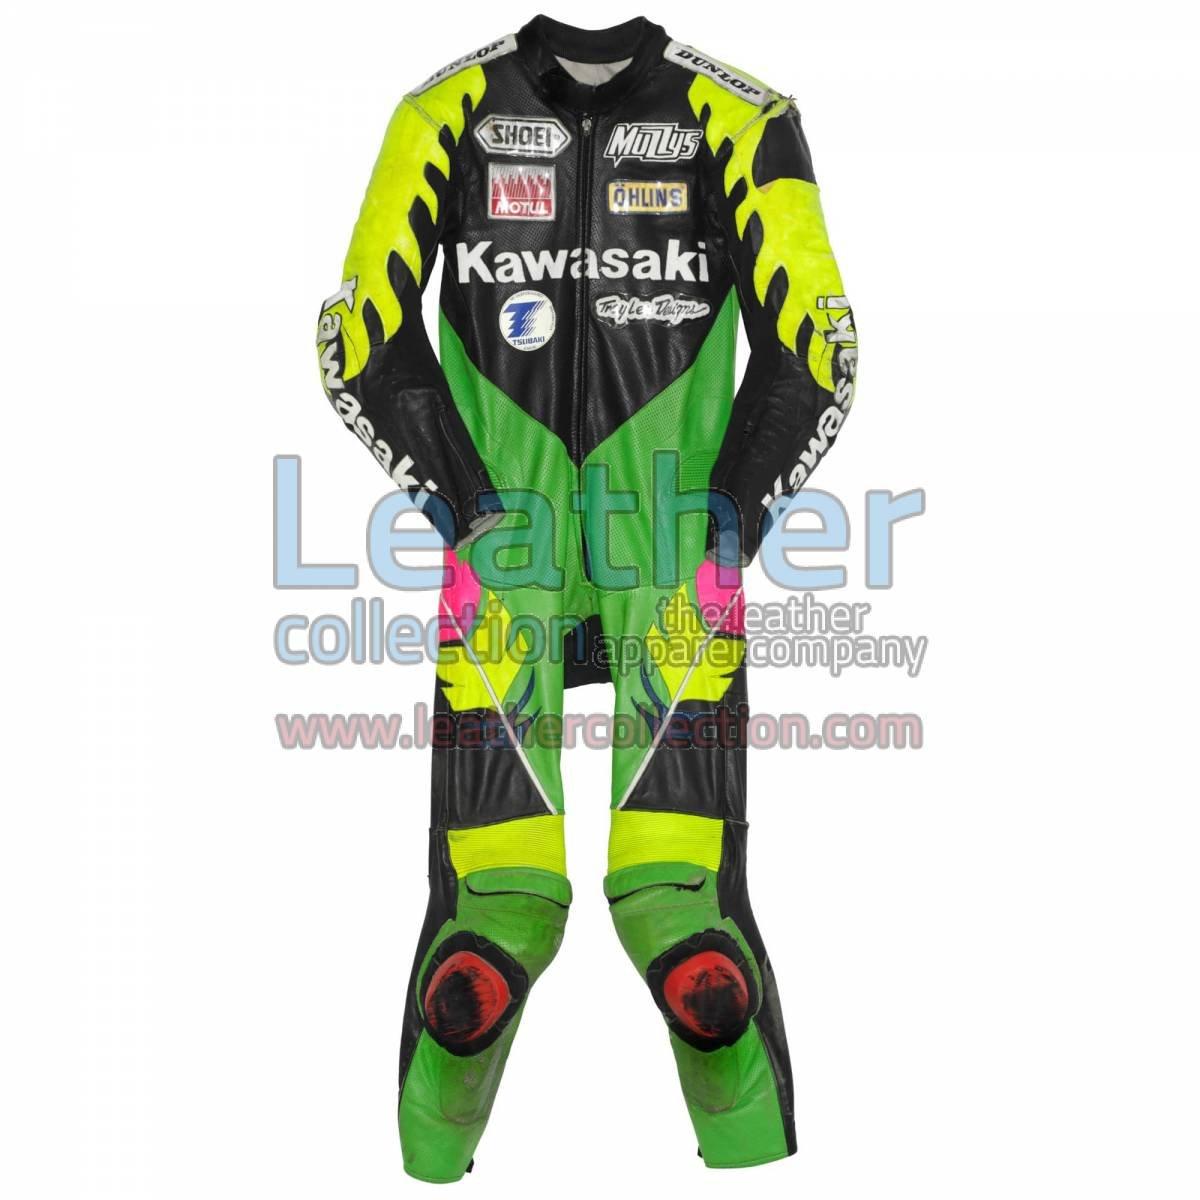 Scott Russell Kawasaki GP 1993 Leather Suit